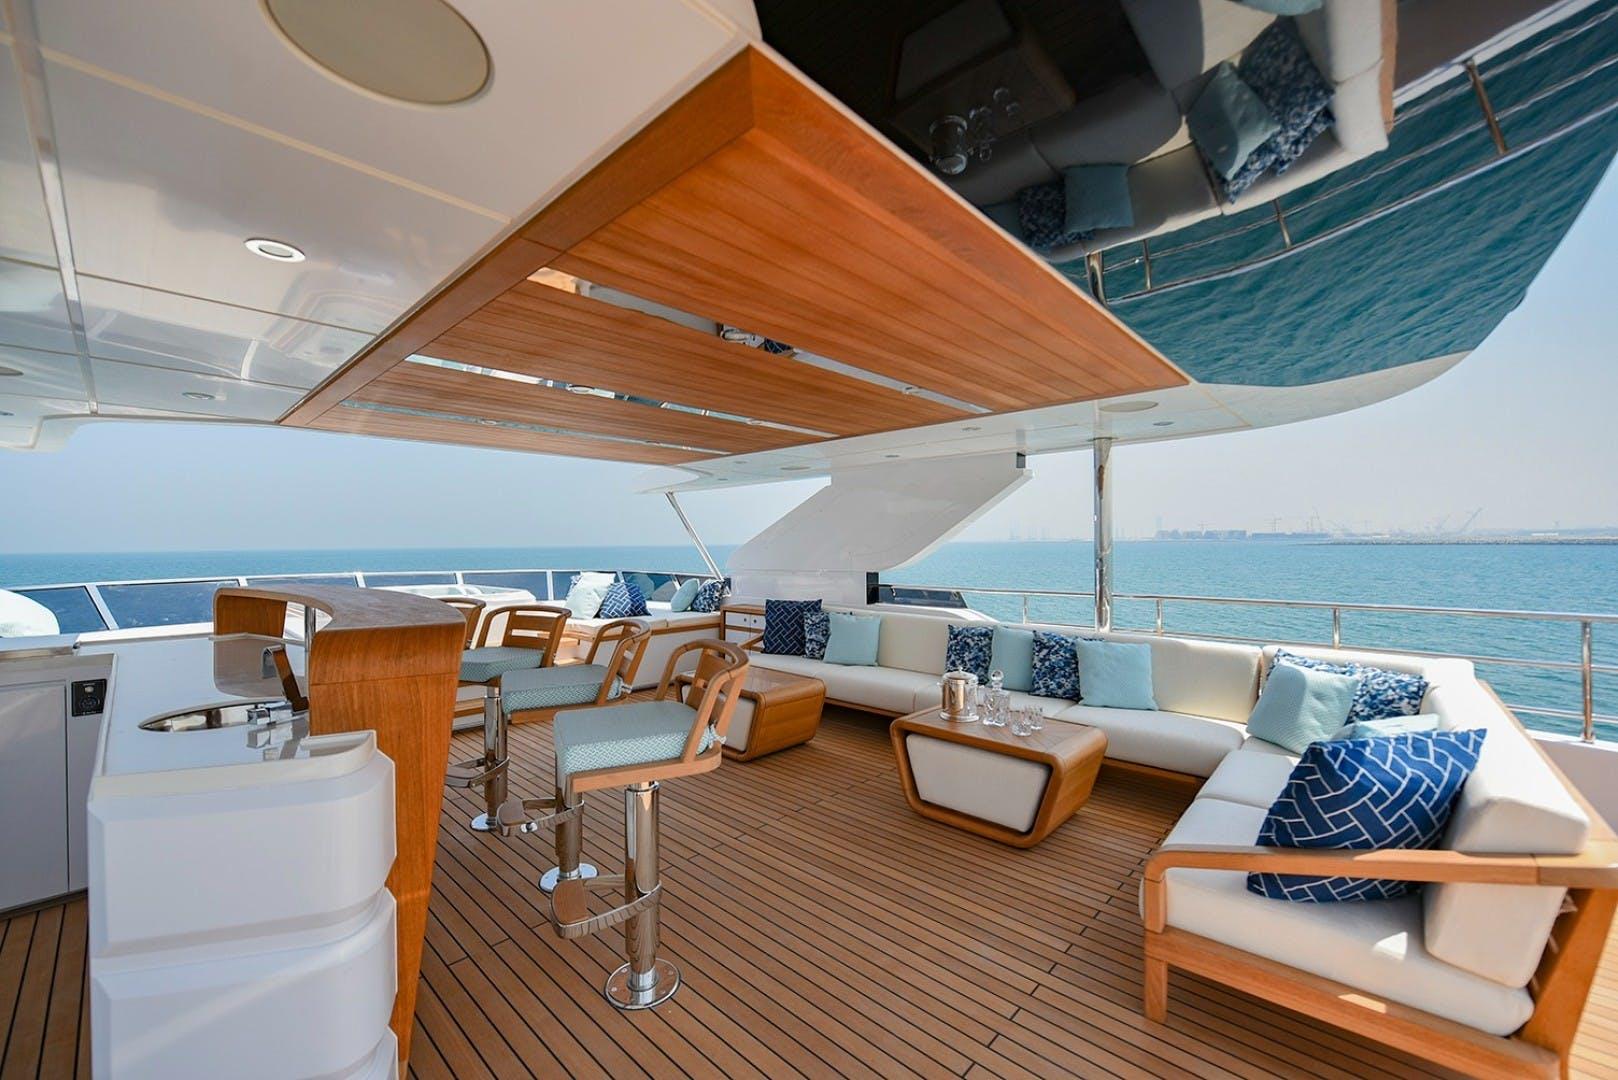 2022 Majesty Yachts 120' Raised Pilothouse MAJESTY 120 | Picture 8 of 39